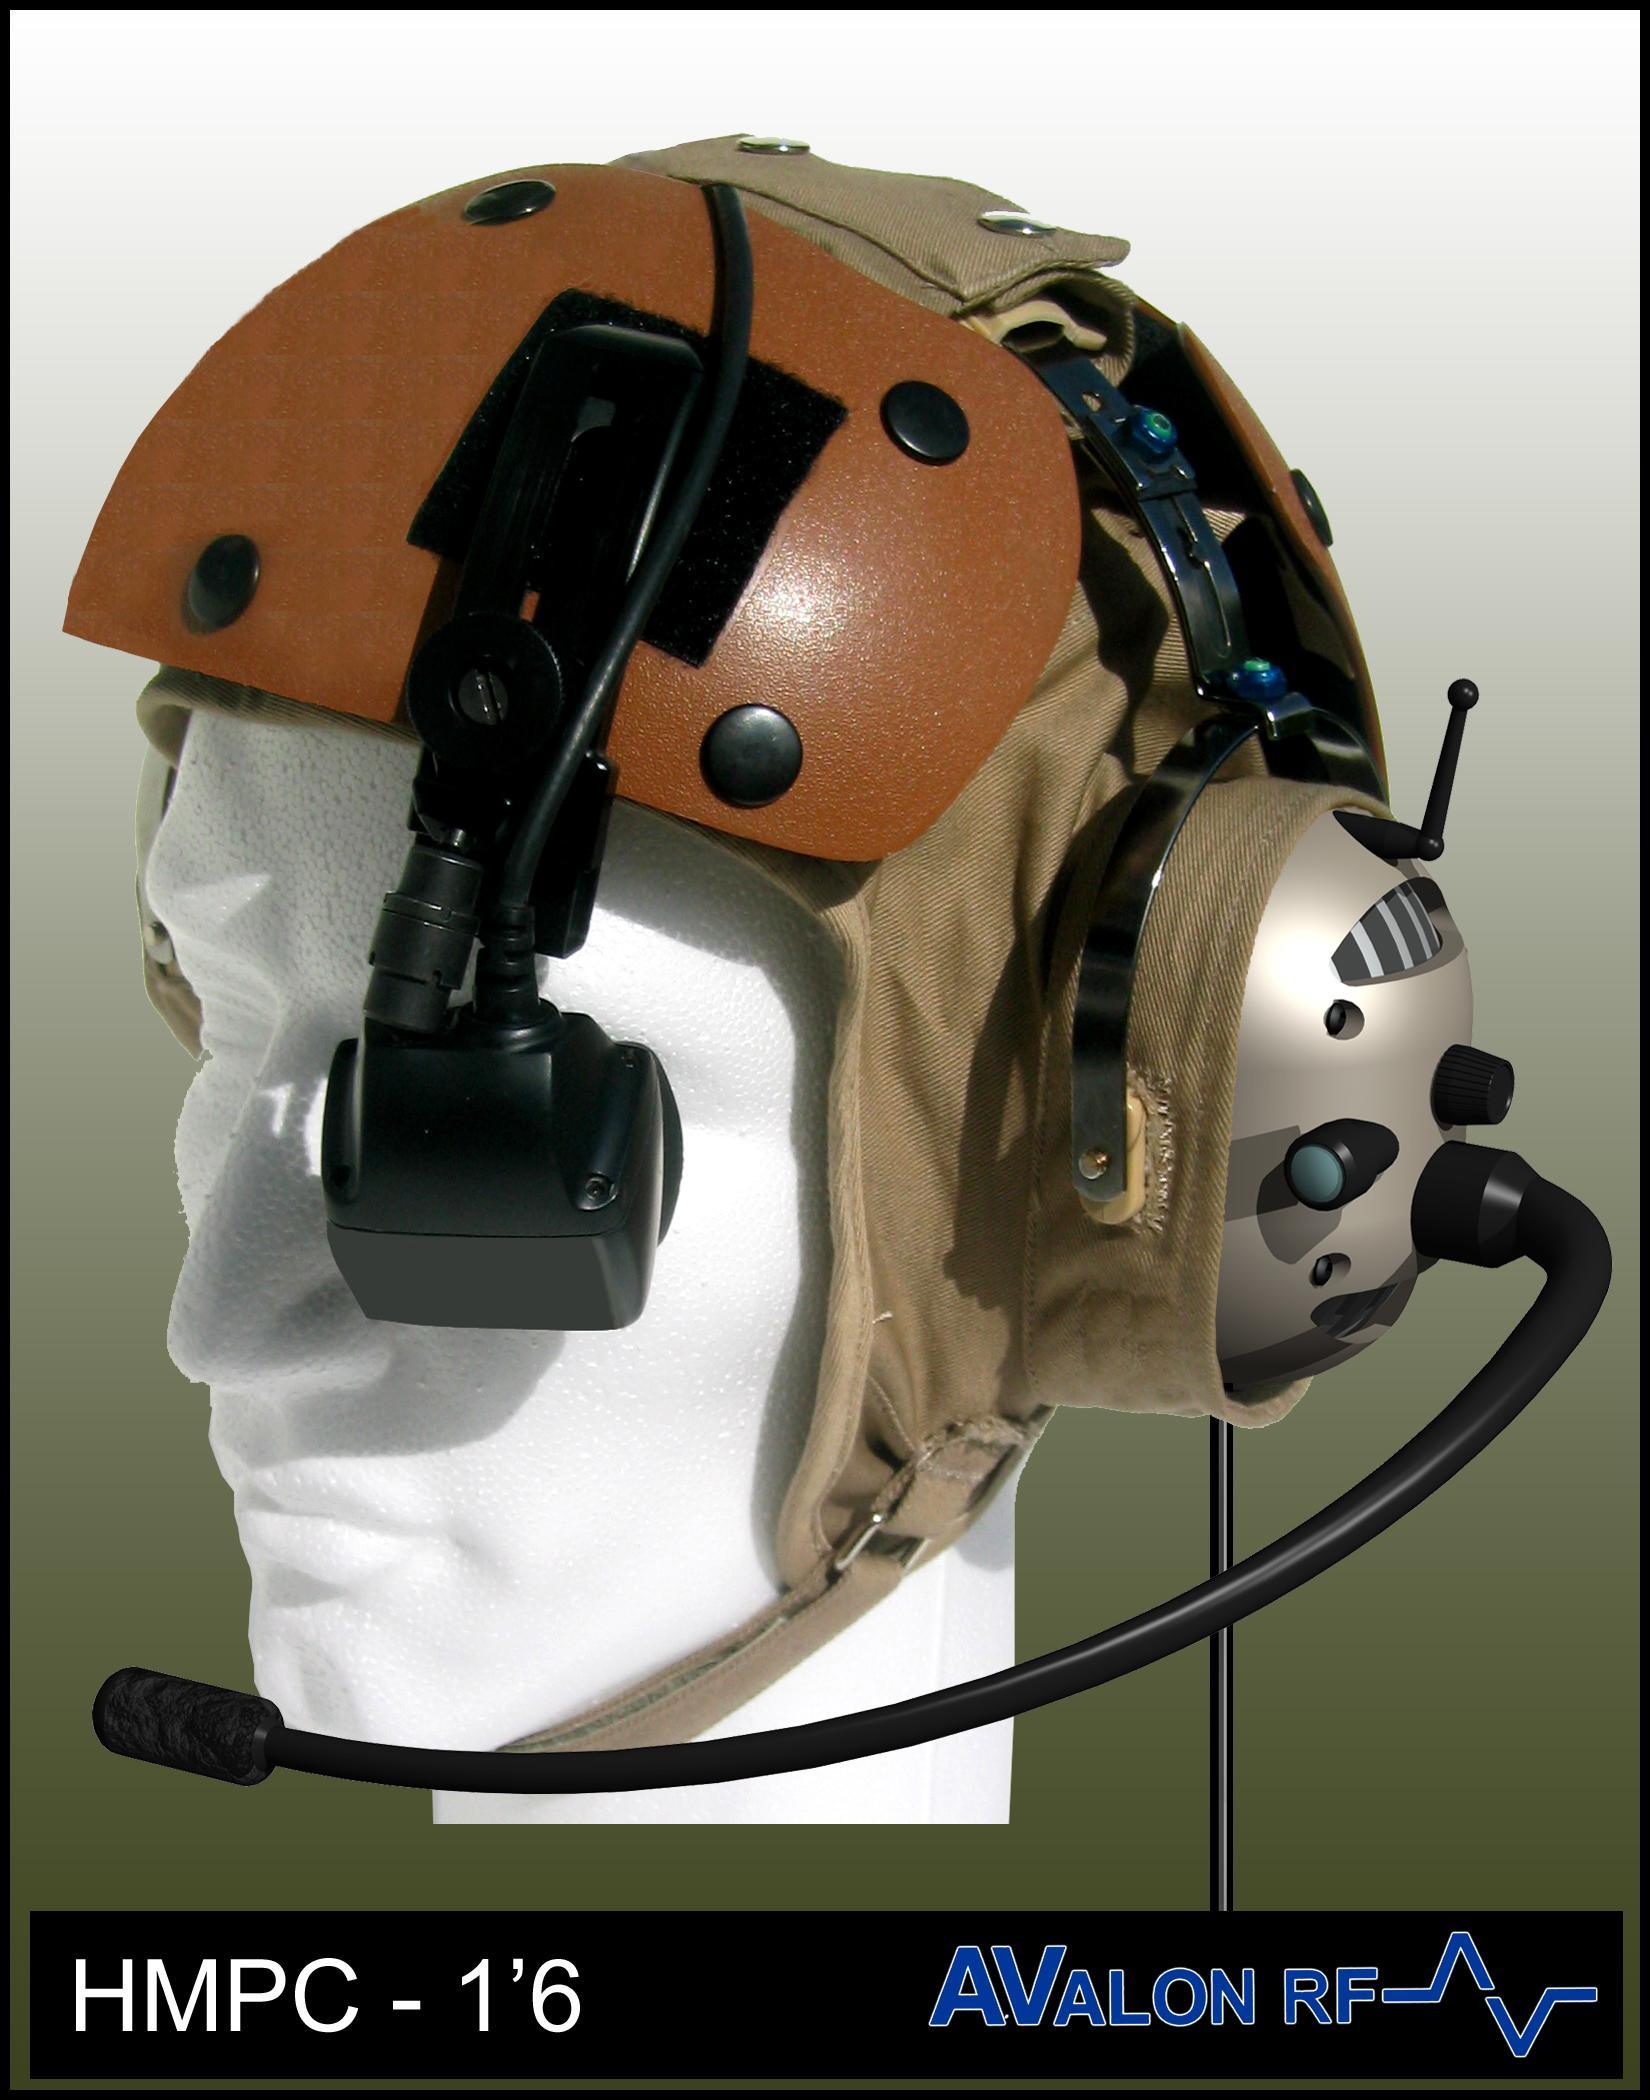 Helmet Display with Wearable Computer